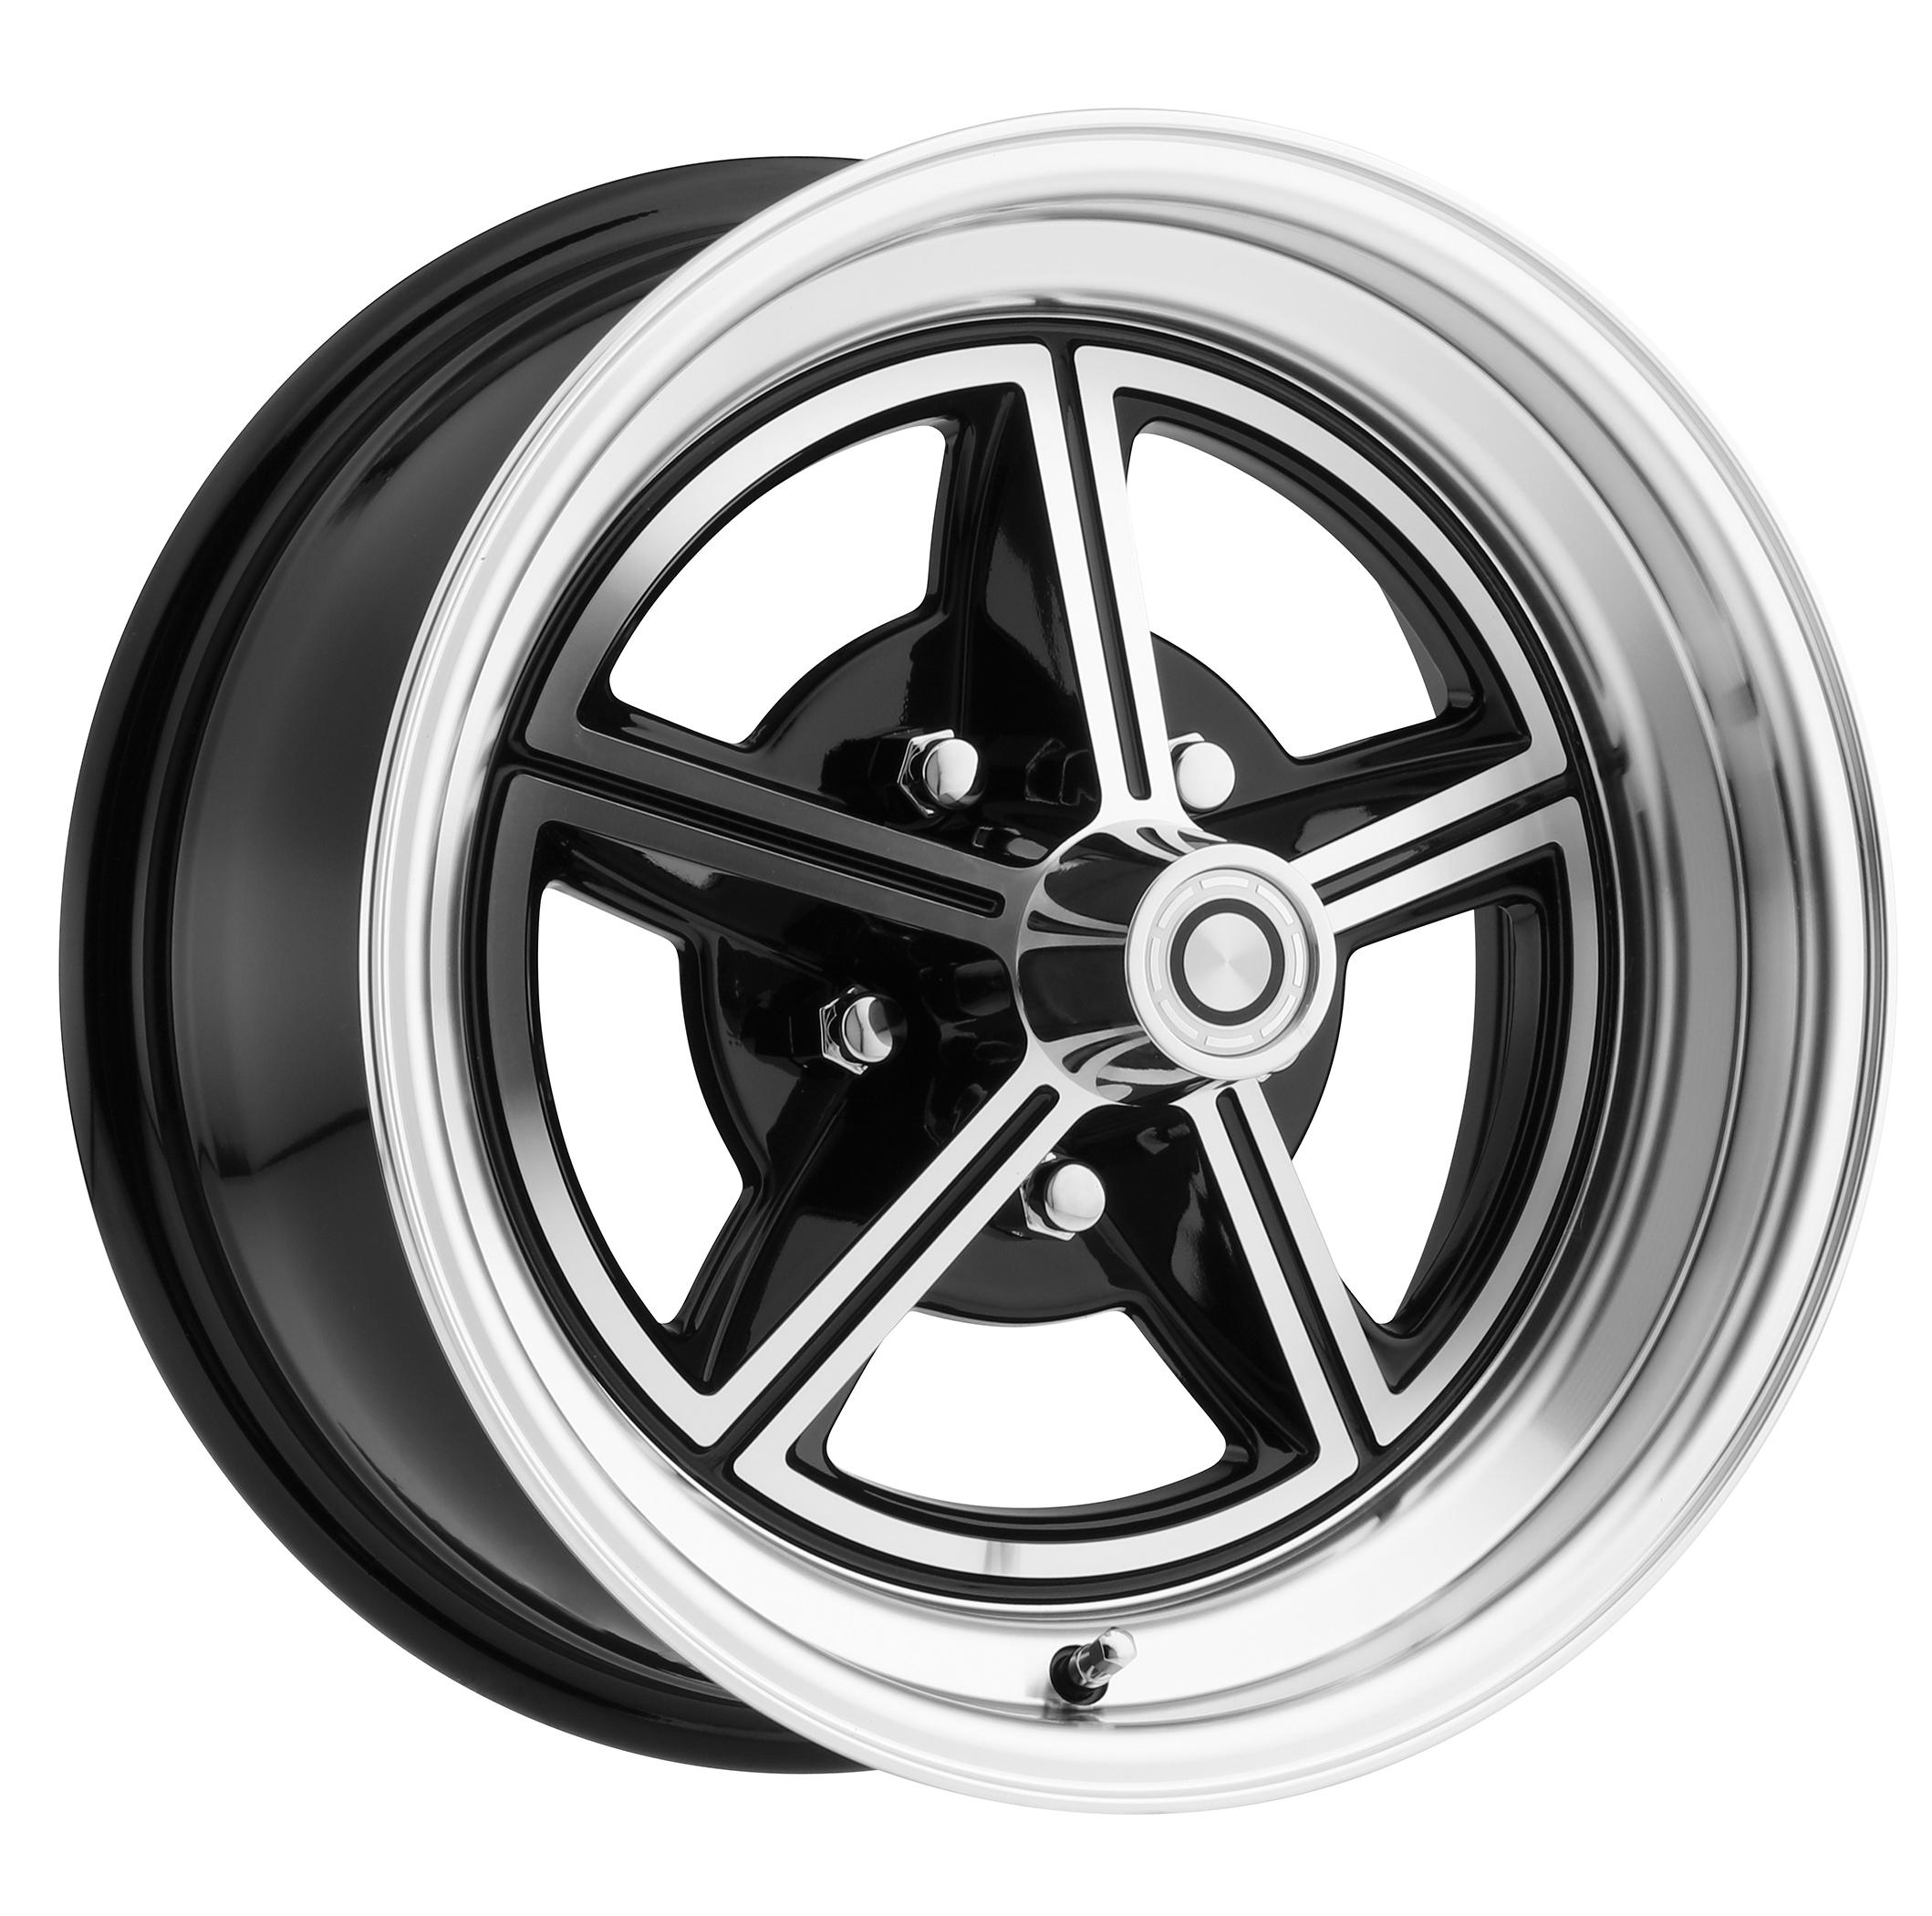 64 73 ford mustang wheel 15x7 aluminum magstar ii lw30 50754a